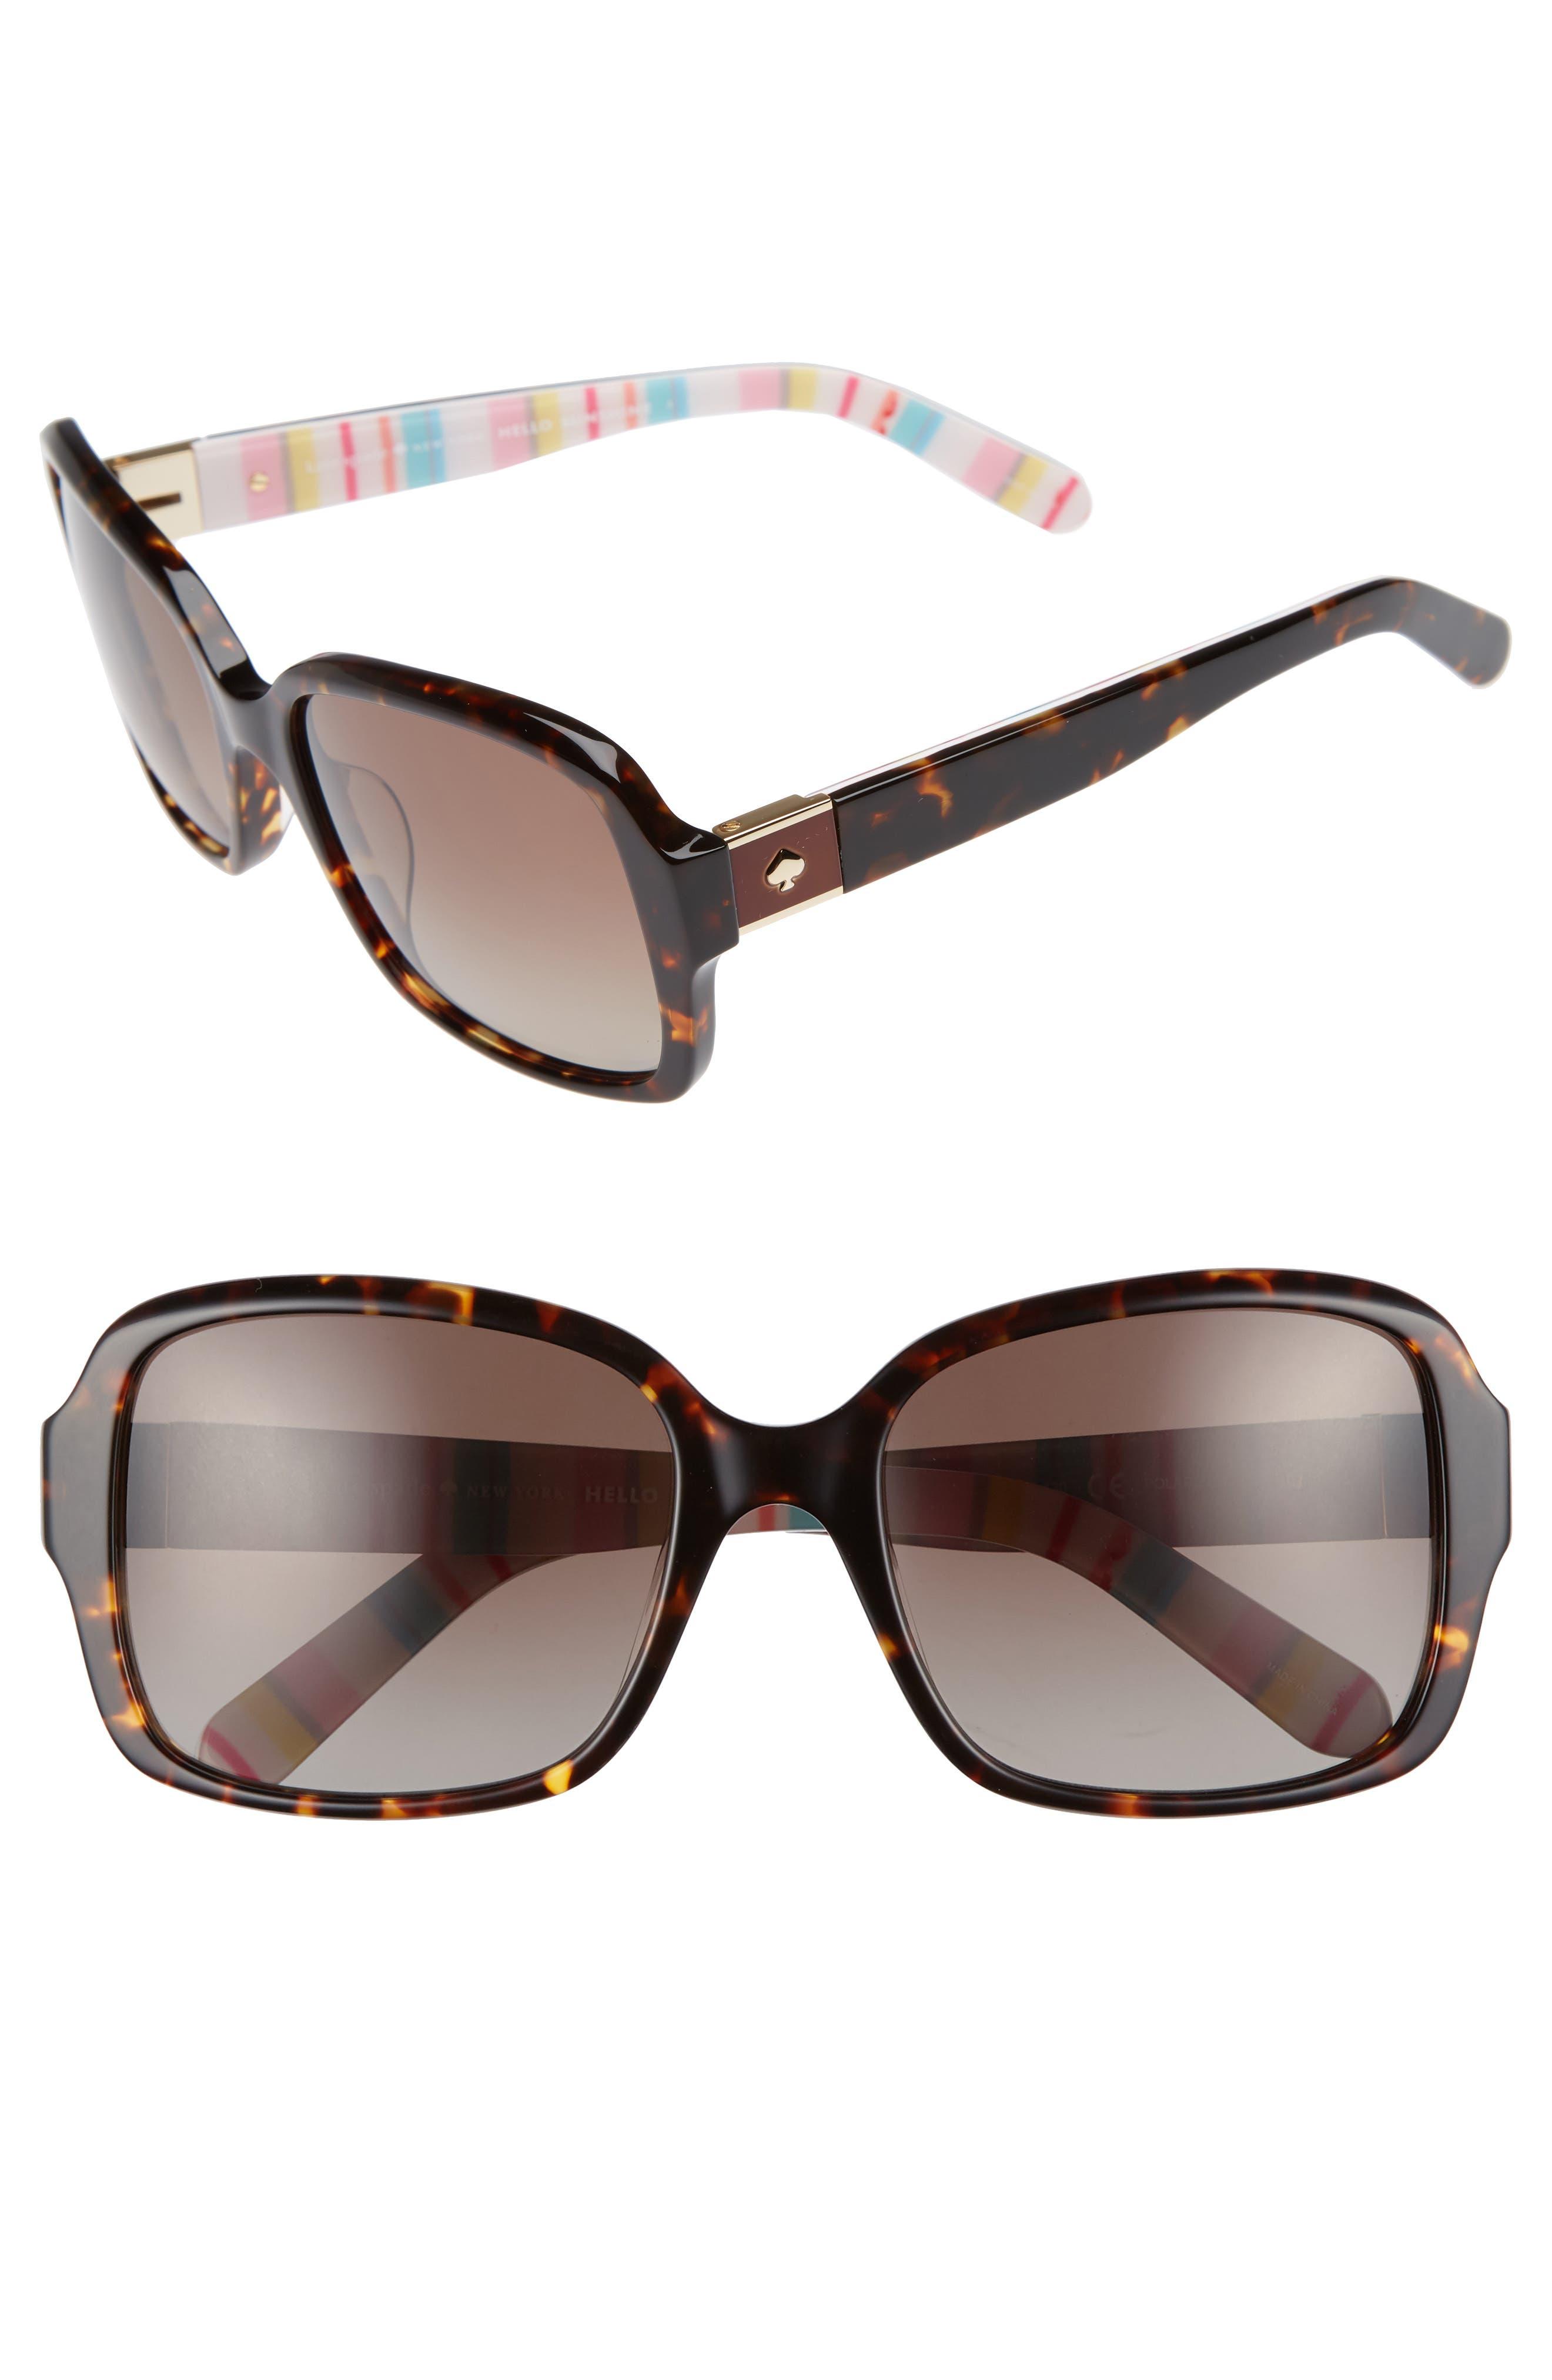 Kate Spade New York Annor 5m Polarized Sunglasses - Havana/ Stripe